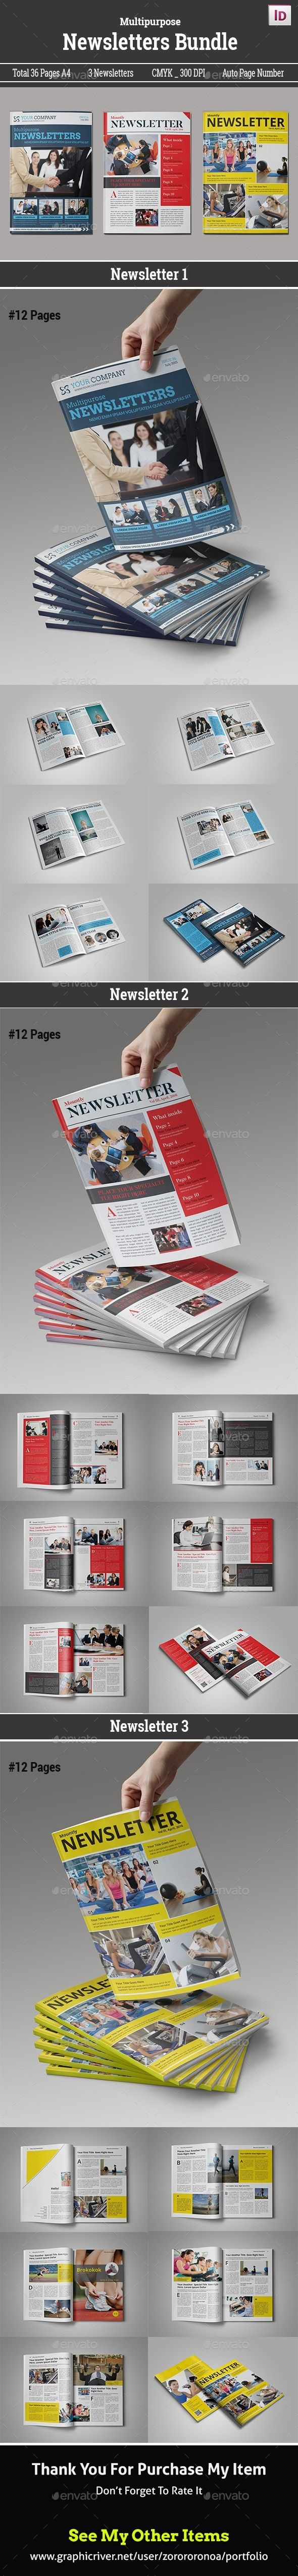 InDesign Newsletter Design Template Bundle - Newsletters Template ...